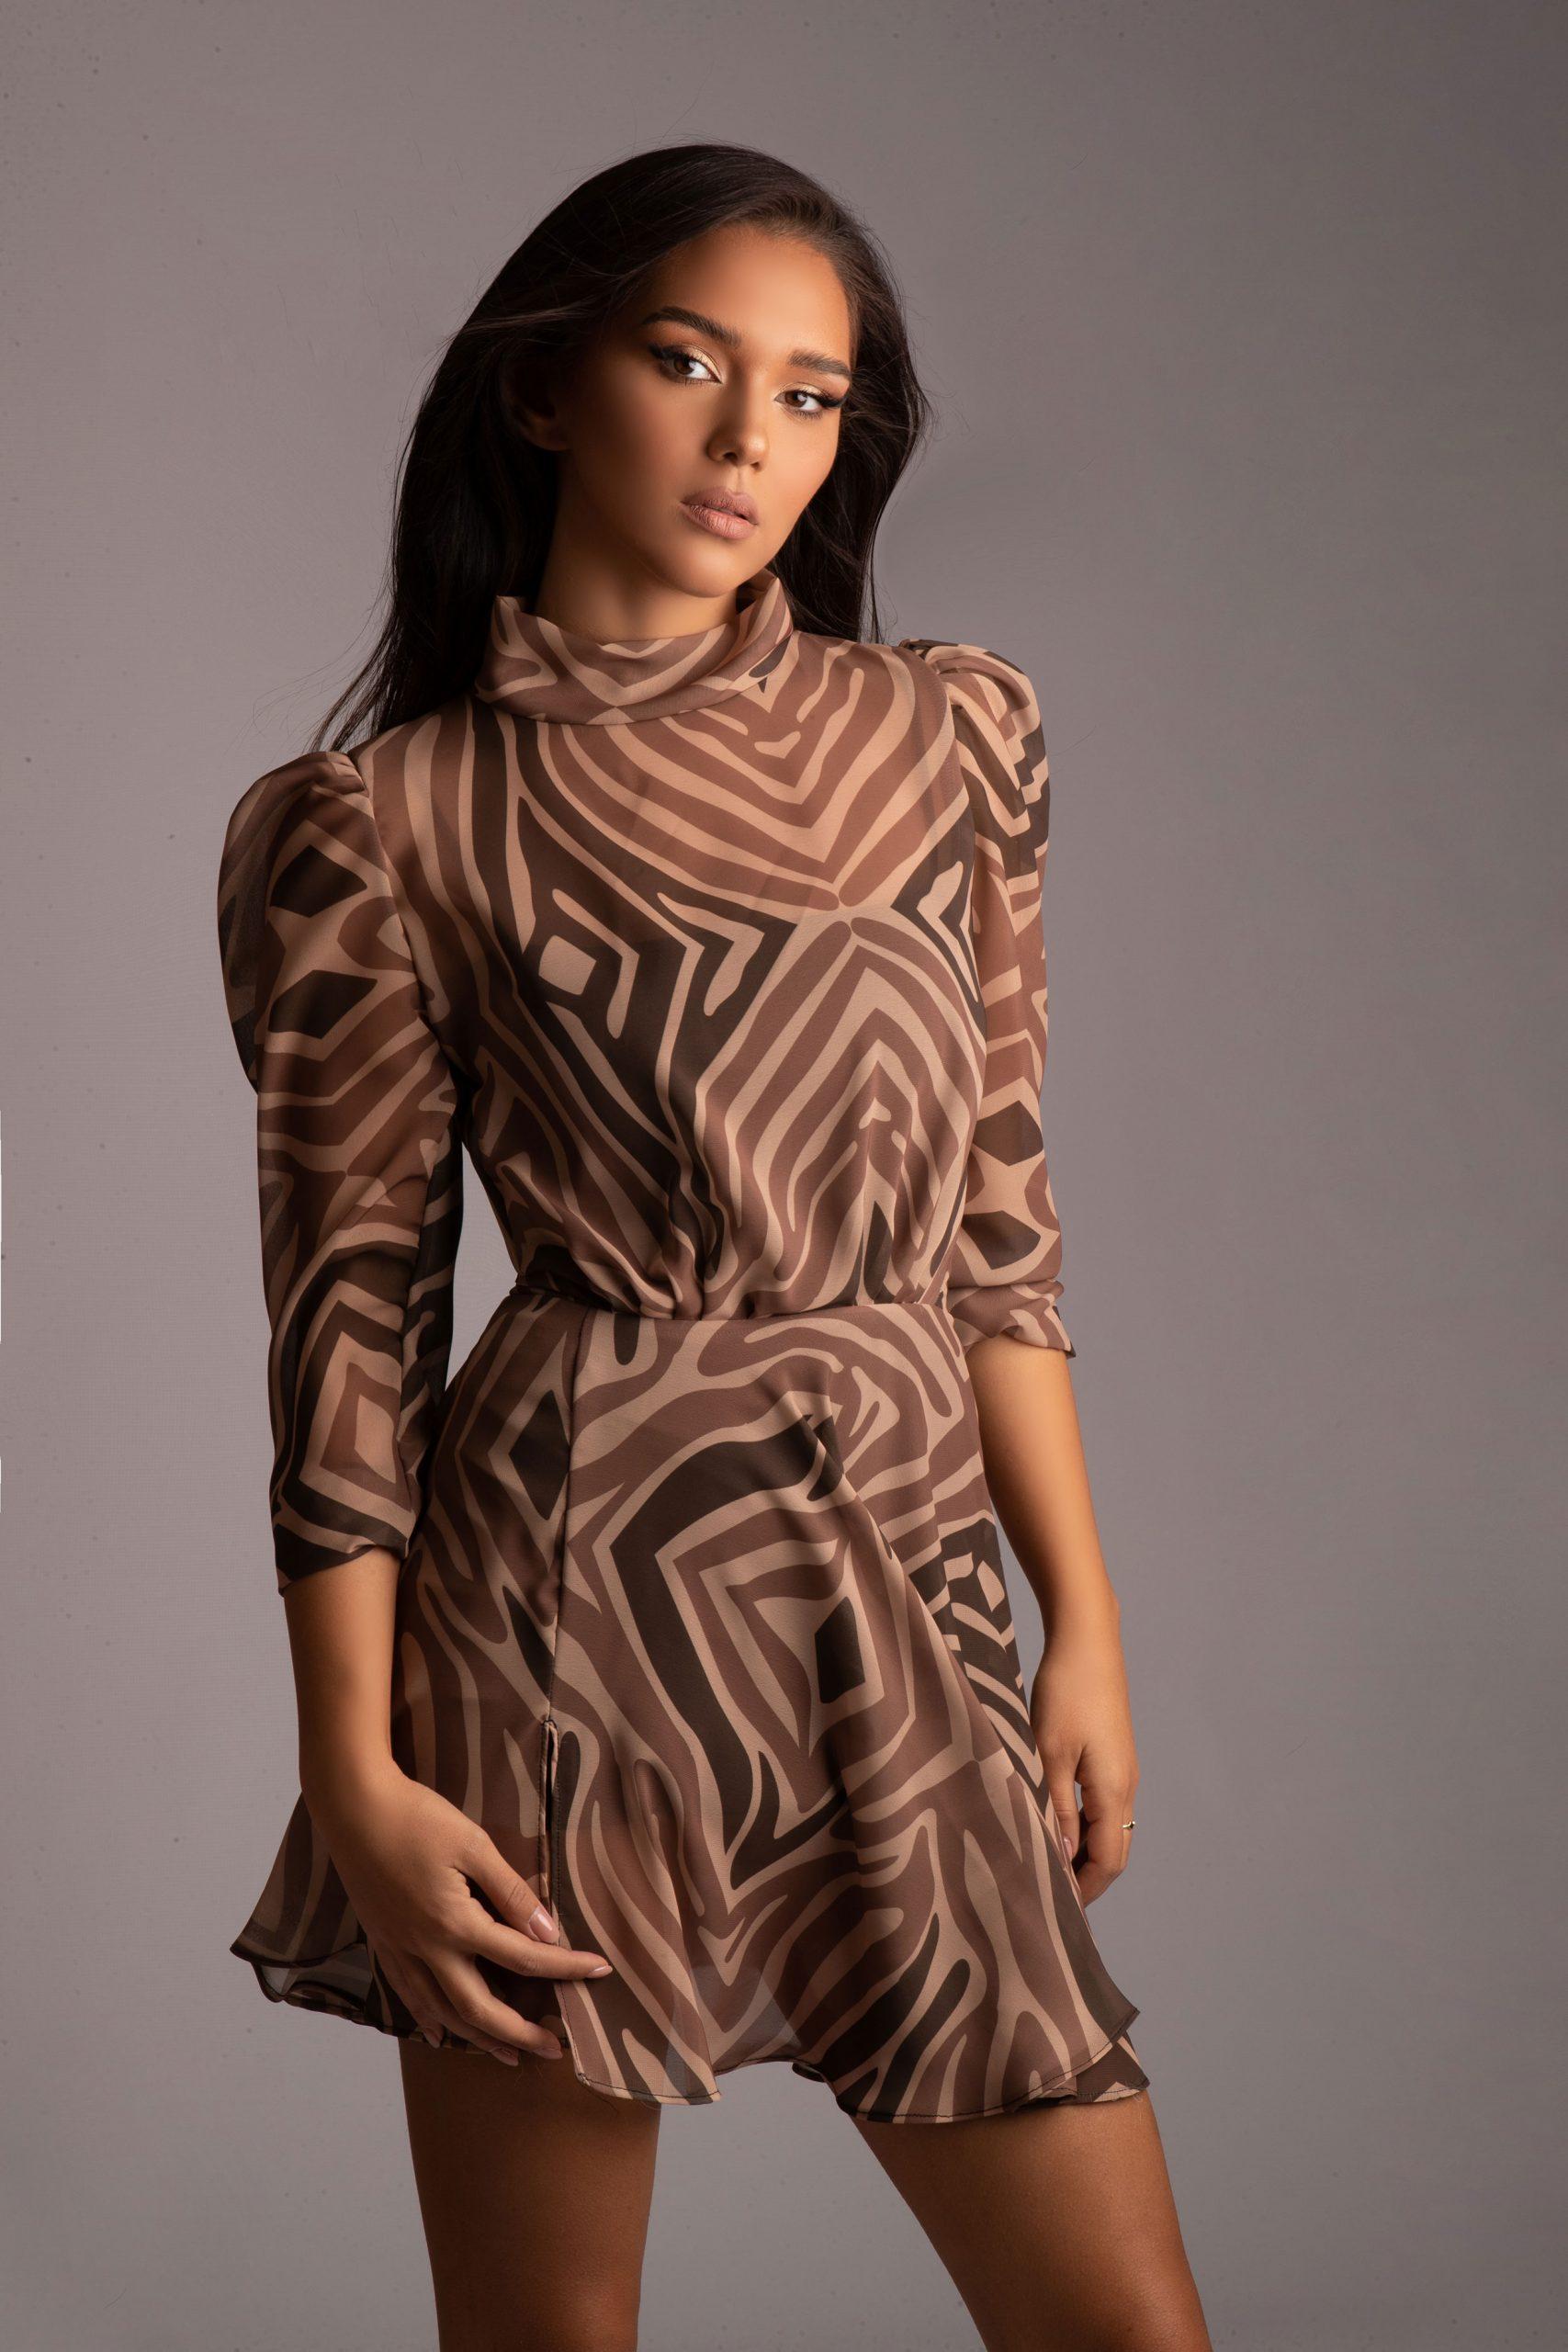 The celebrity marketer wearing Jungle Humans' dress